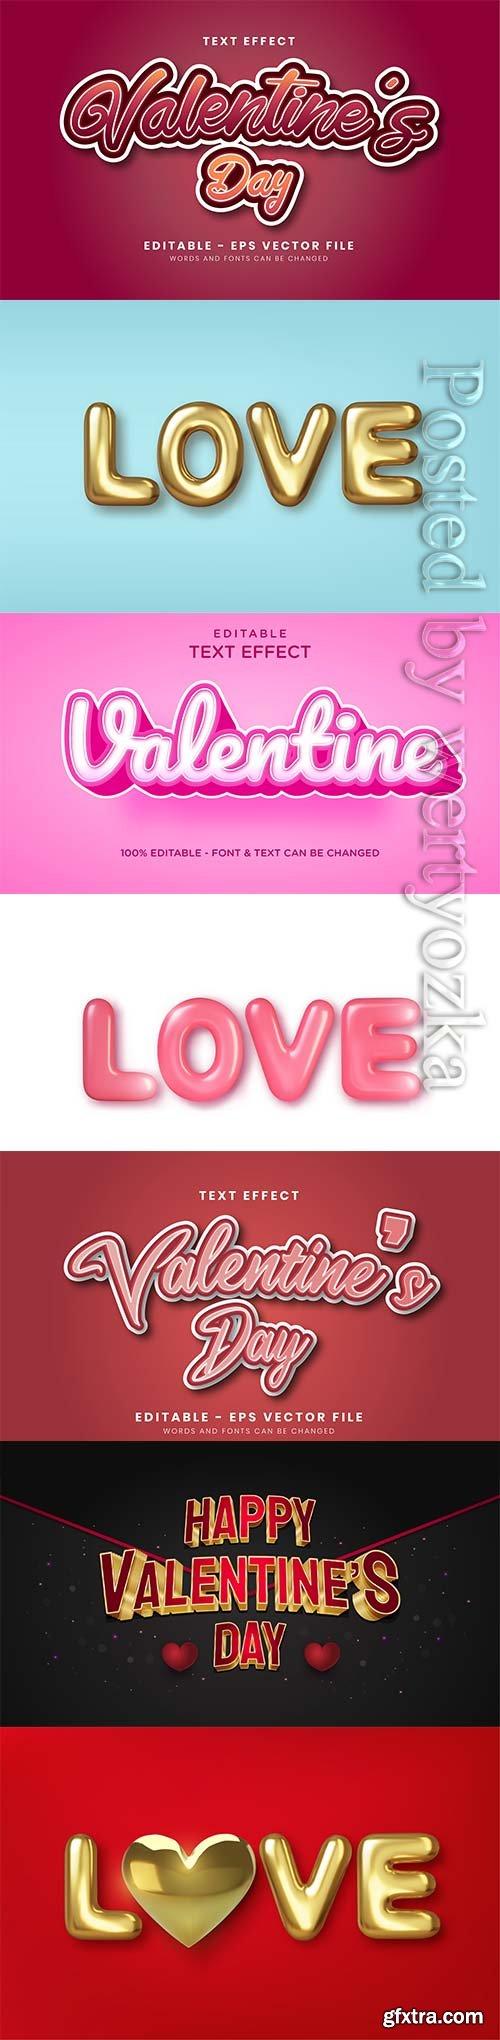 3d editable text style effect vector vol 244